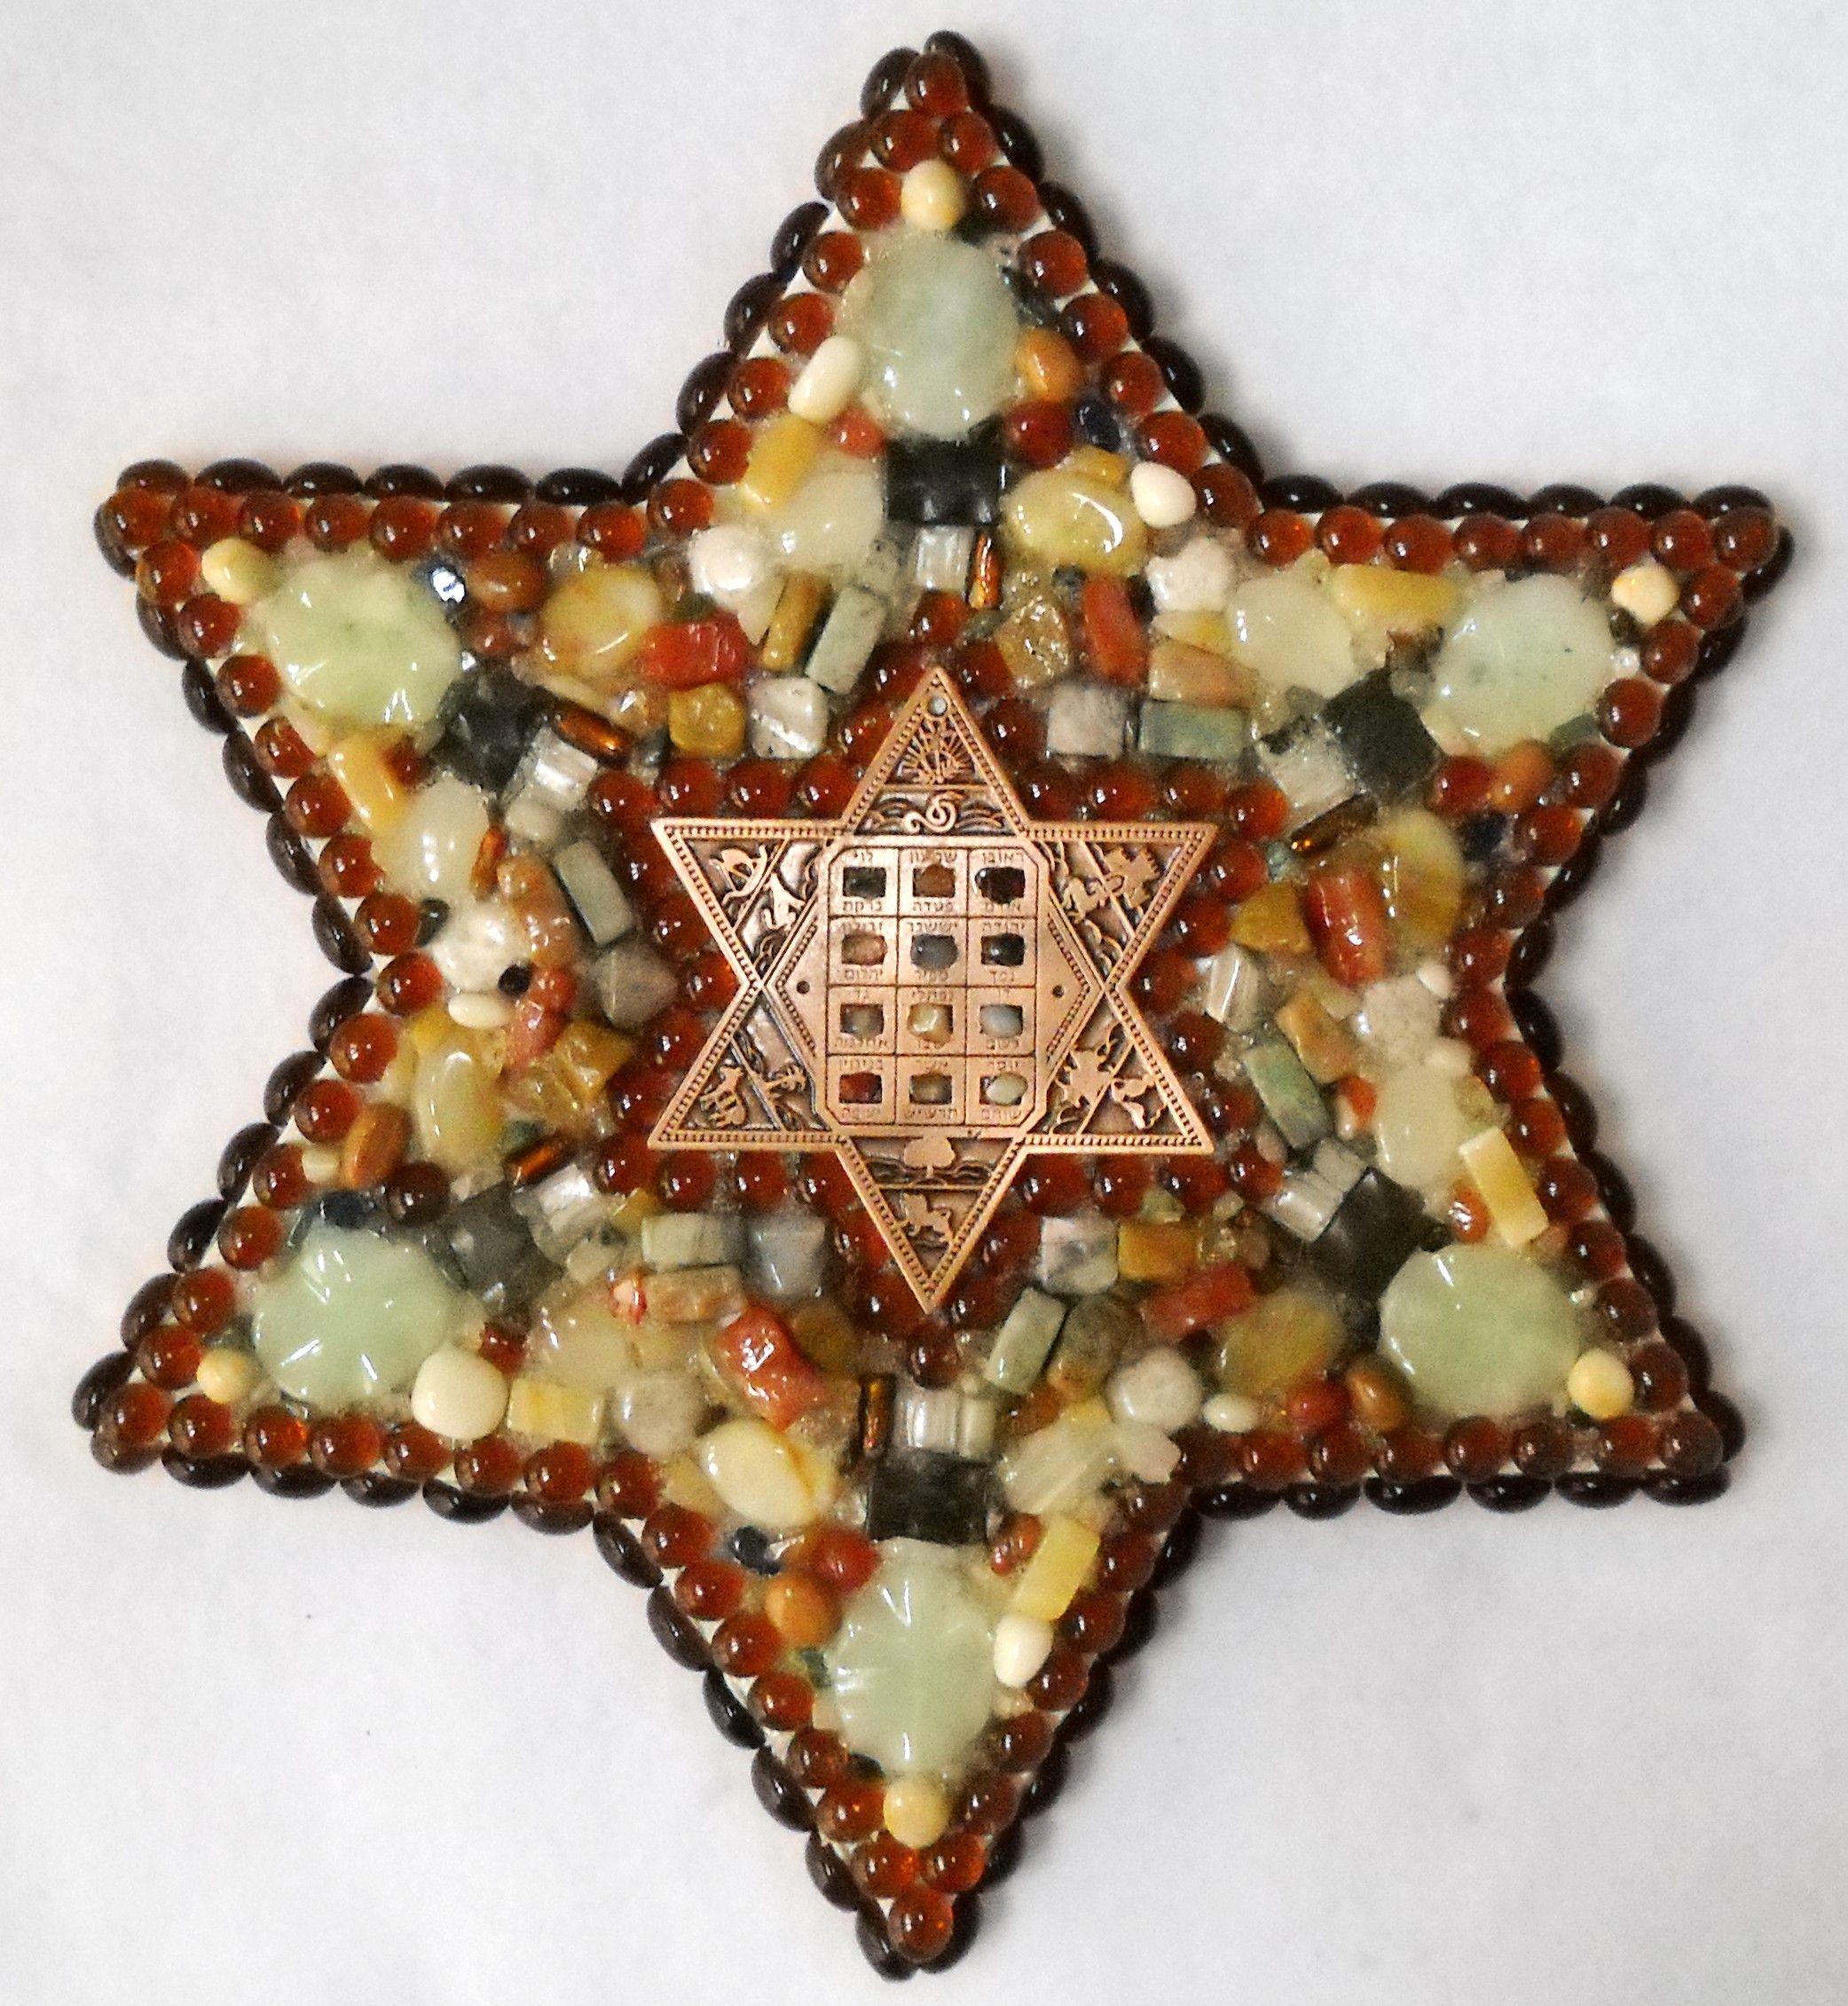 The Medium 17 1 2 In Diameter Star Of David With Hoshen